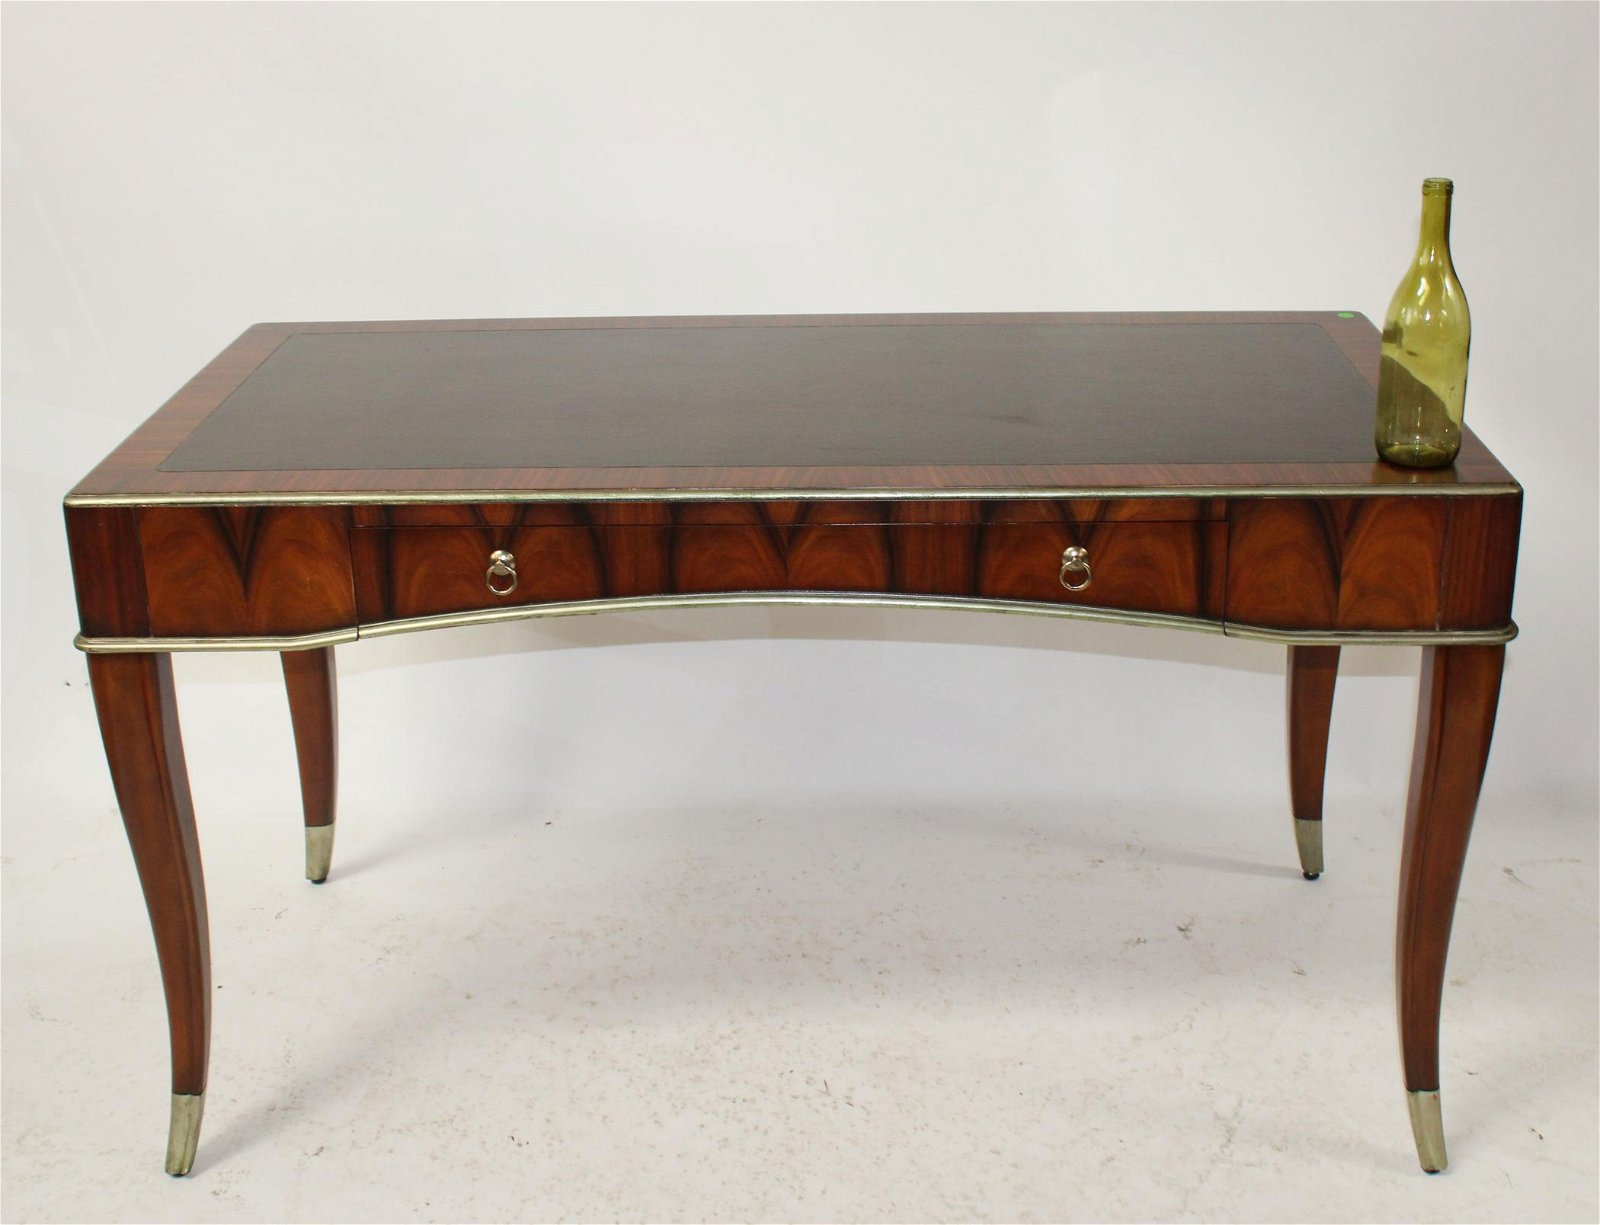 Modern leather top bureauplat desk